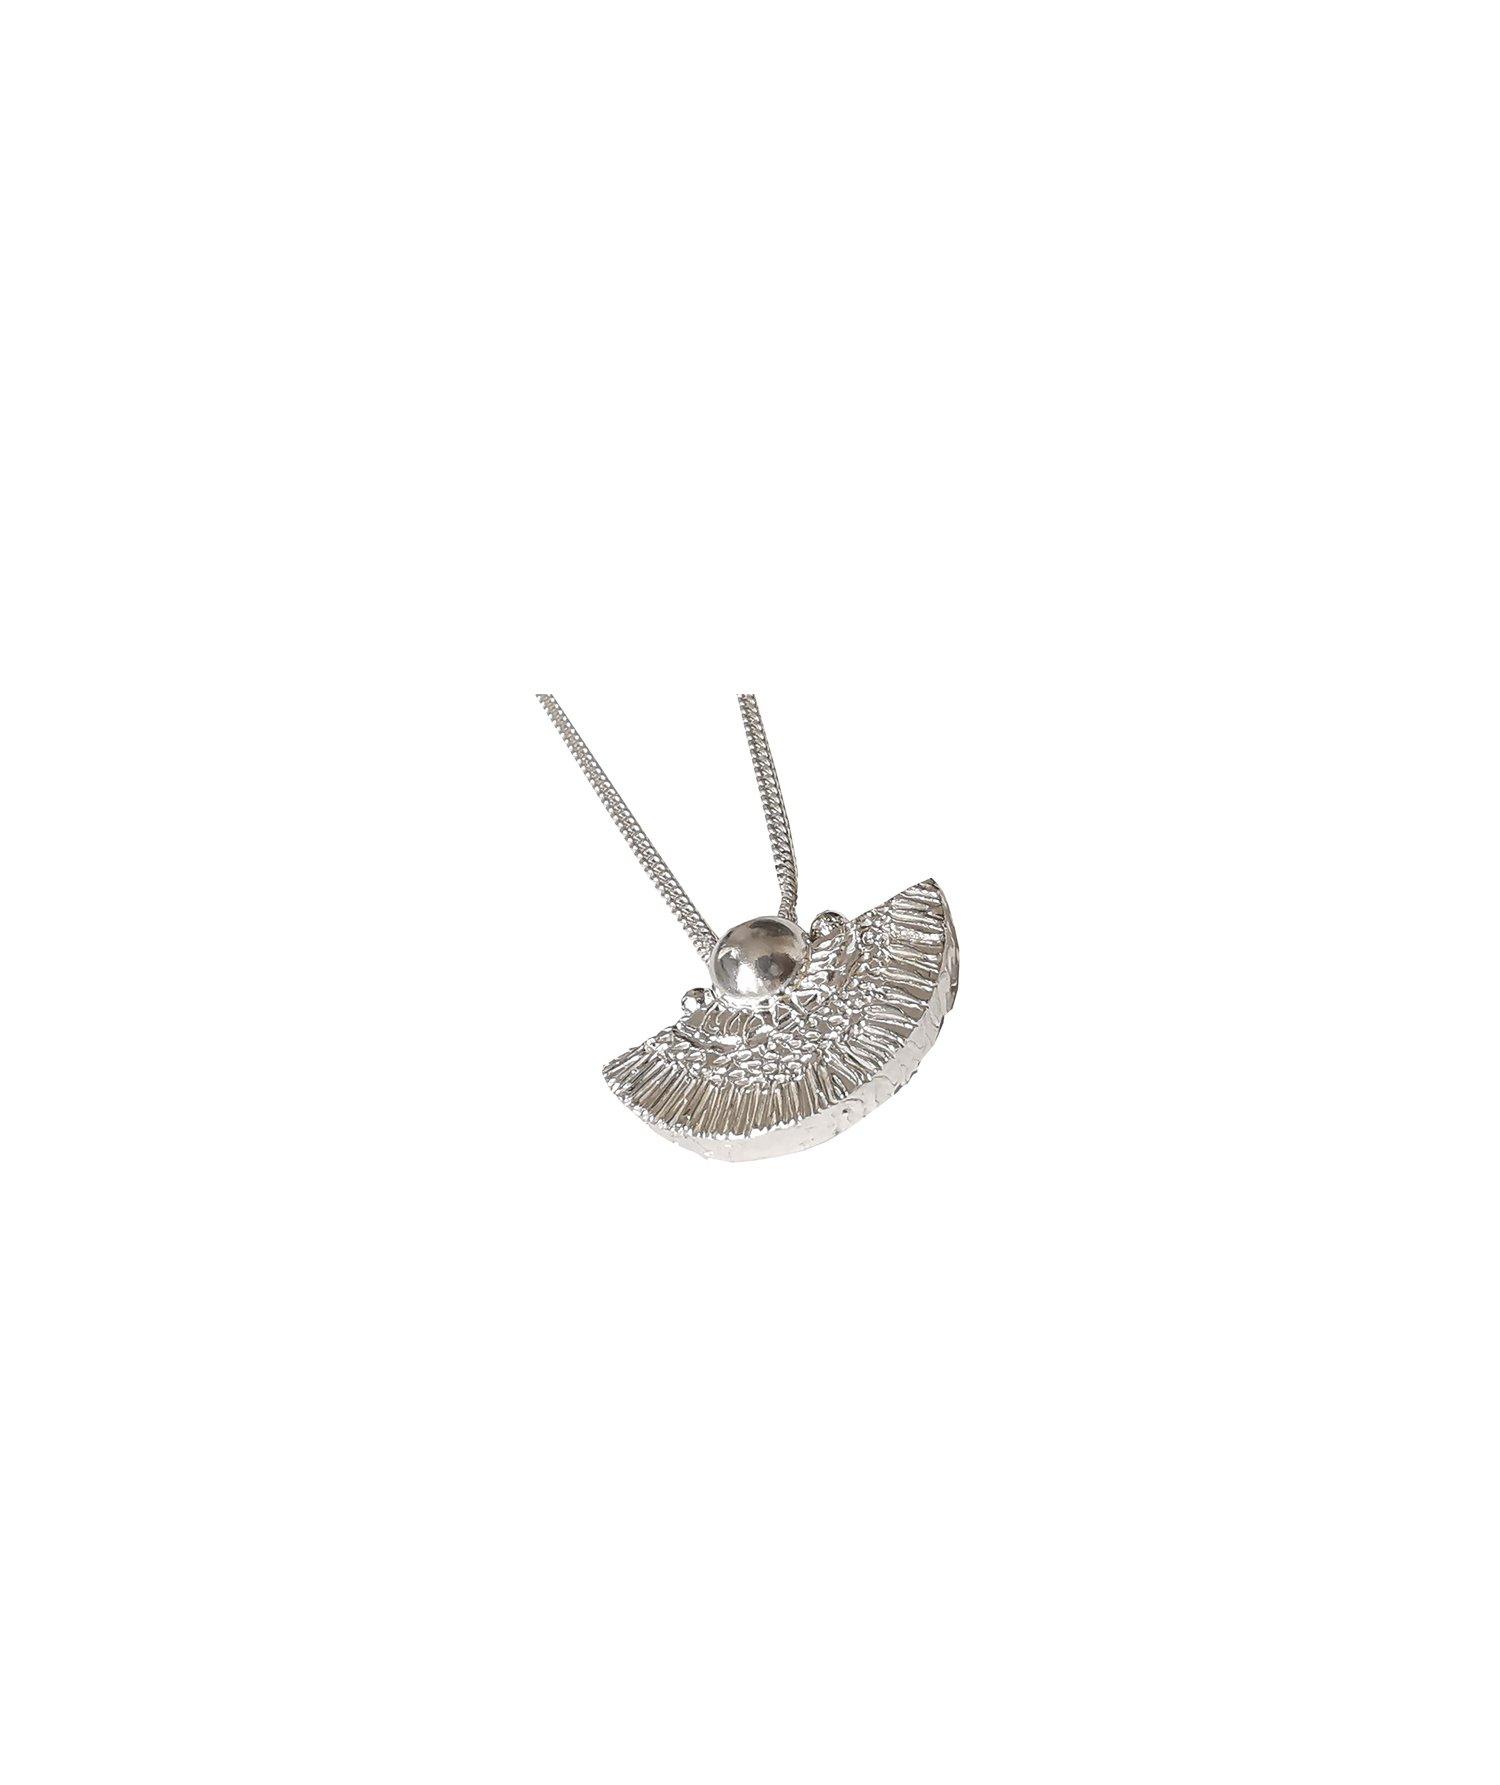 Image of Imprint Pendant silver